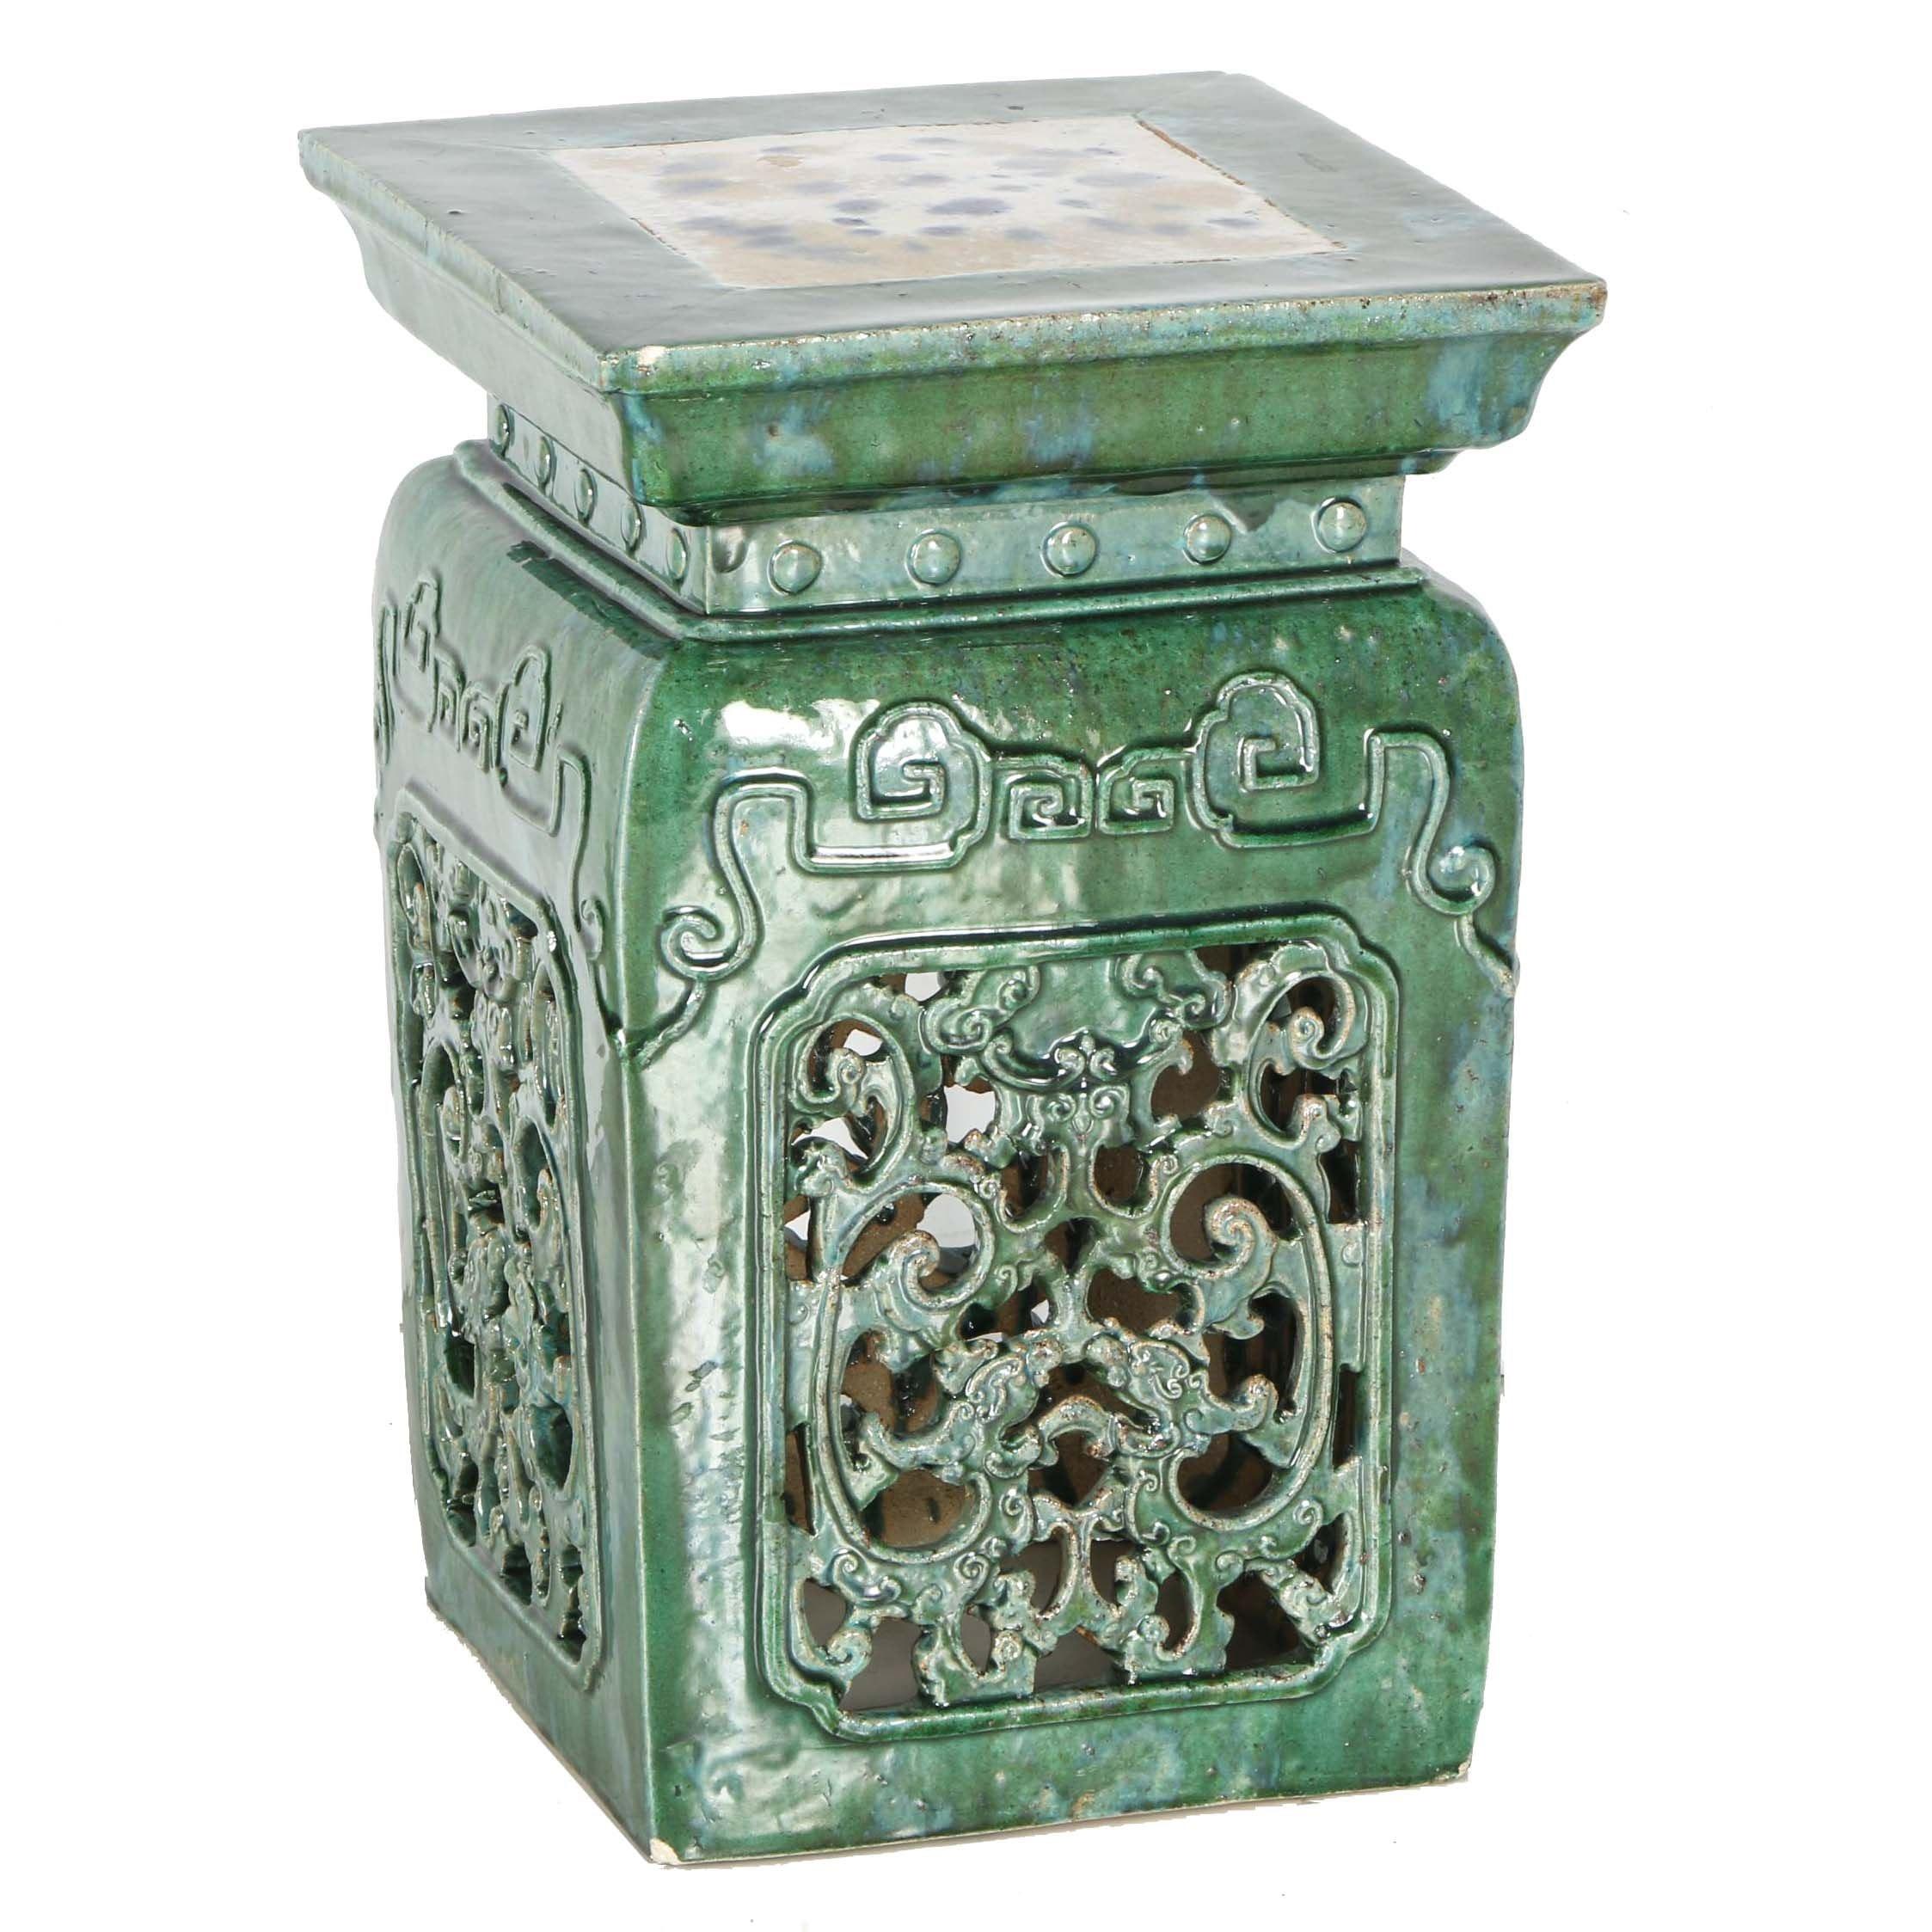 Antique Chinese Glazed Ceramic Garden Stool